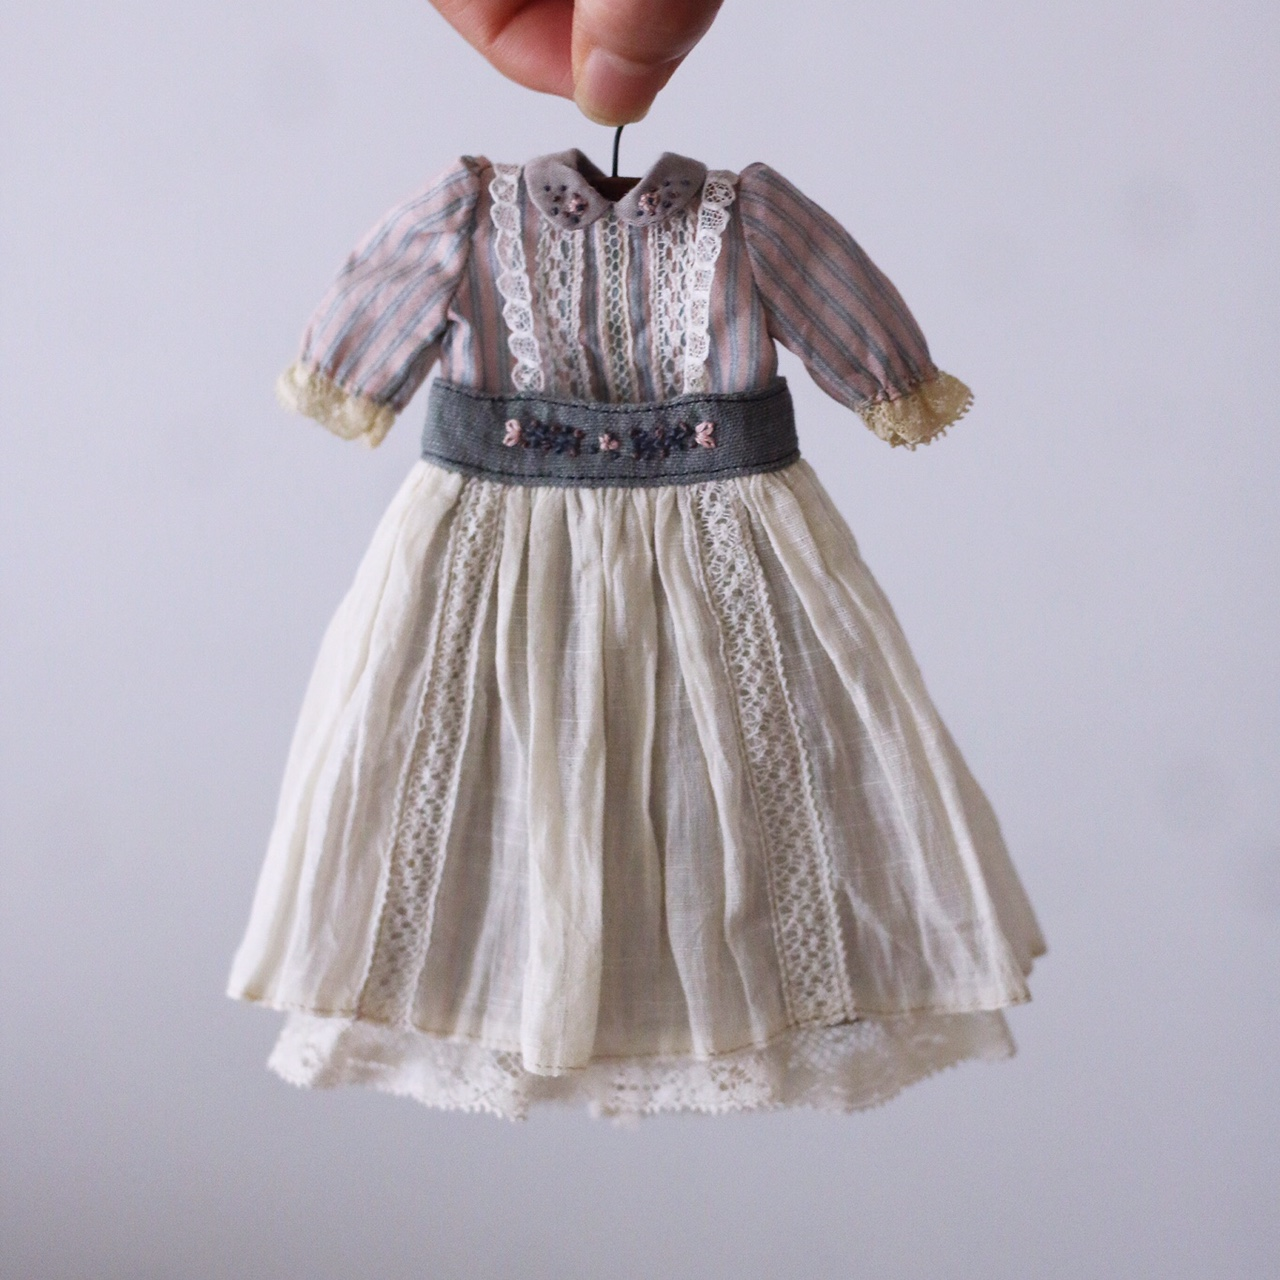 Hanon fabric dress